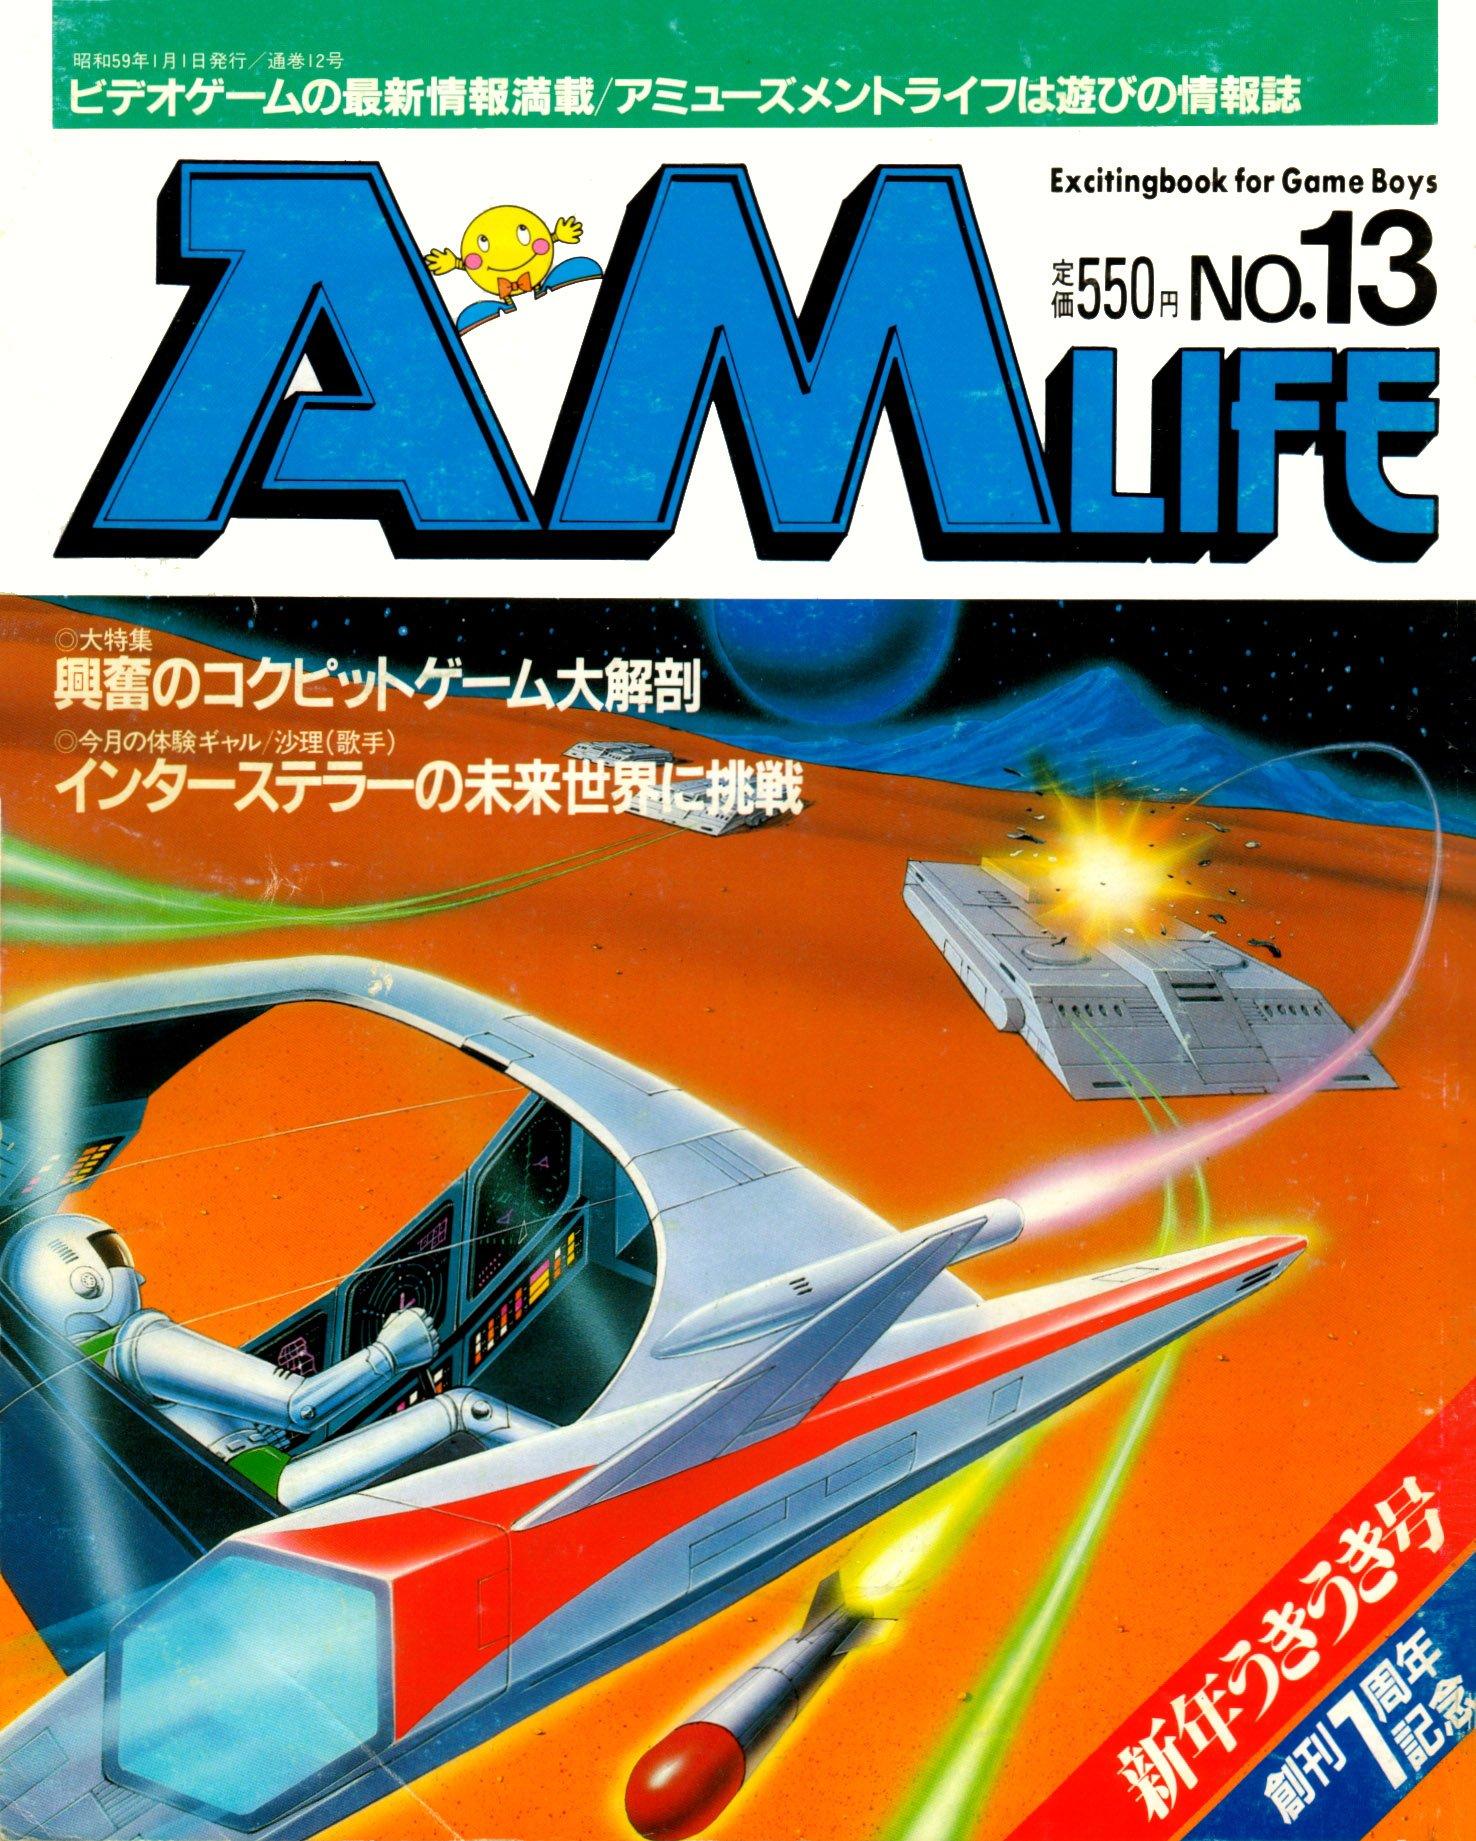 Amusement Life Issue 13 (January 1984)